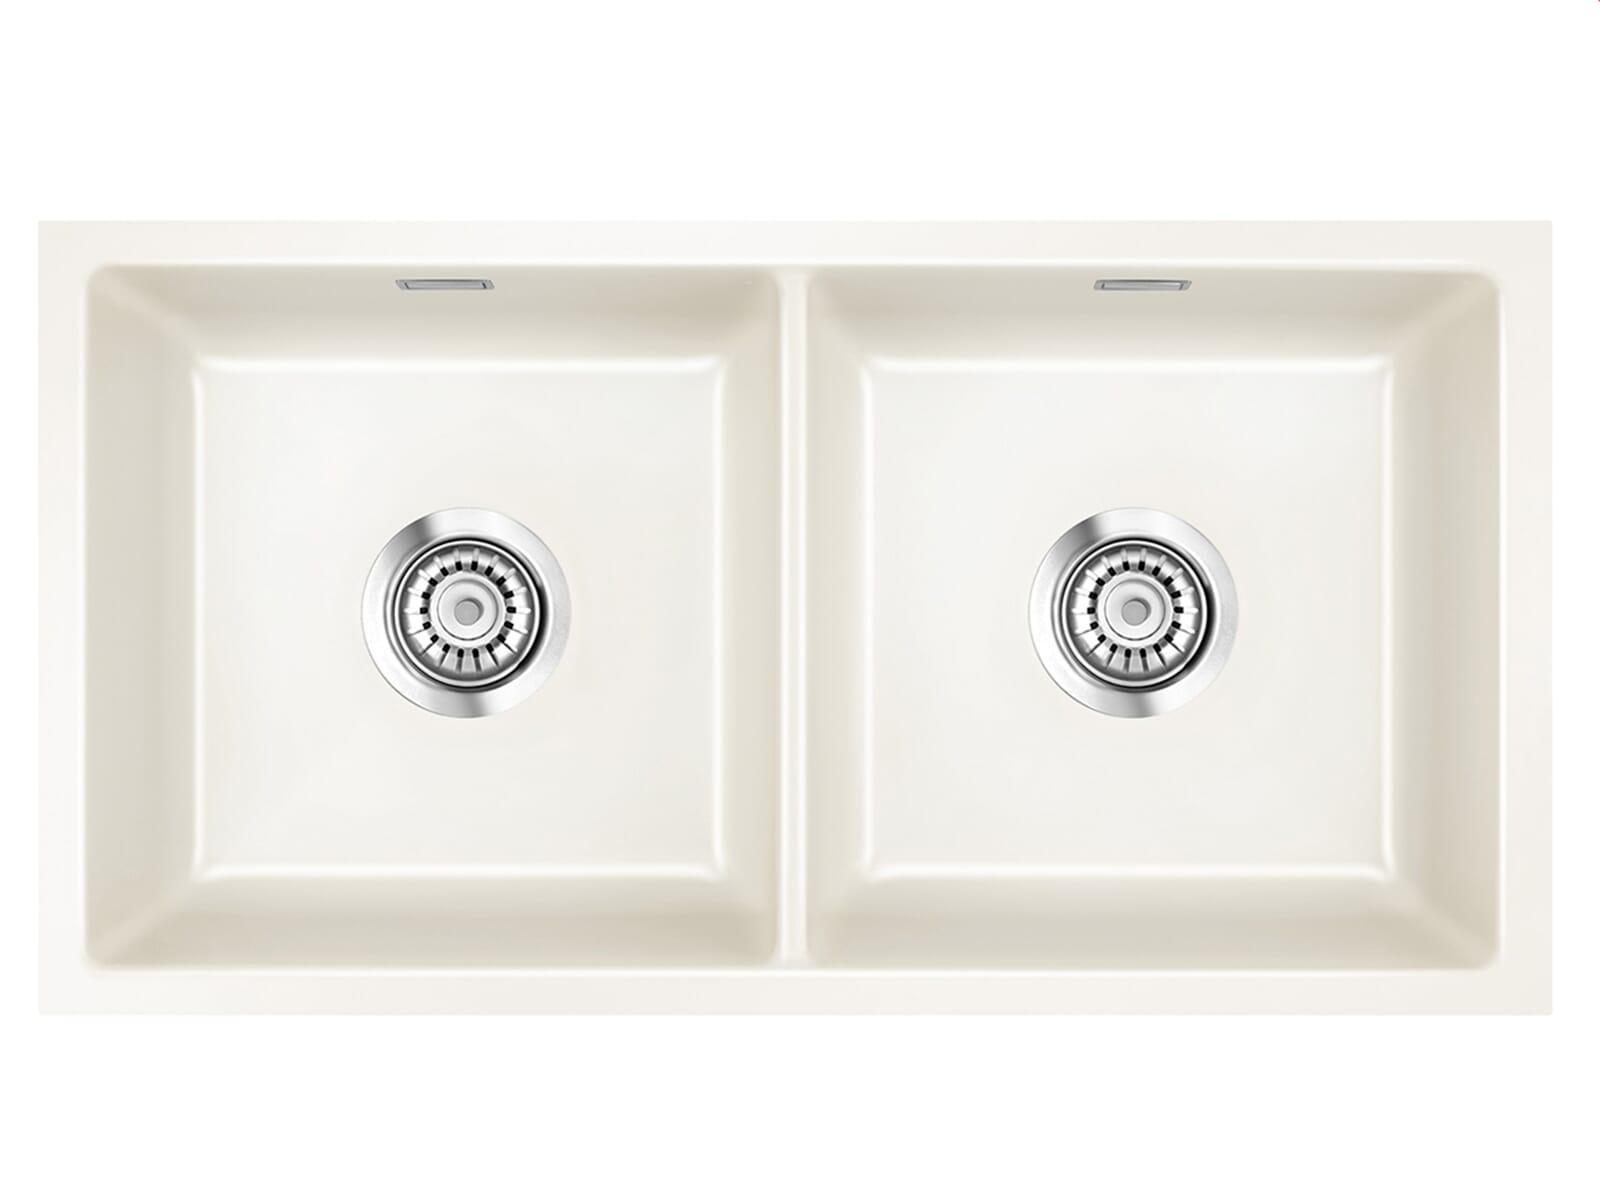 Systemceram Mera Twin U Magnolie Keramikspüle Excenterbetätigung